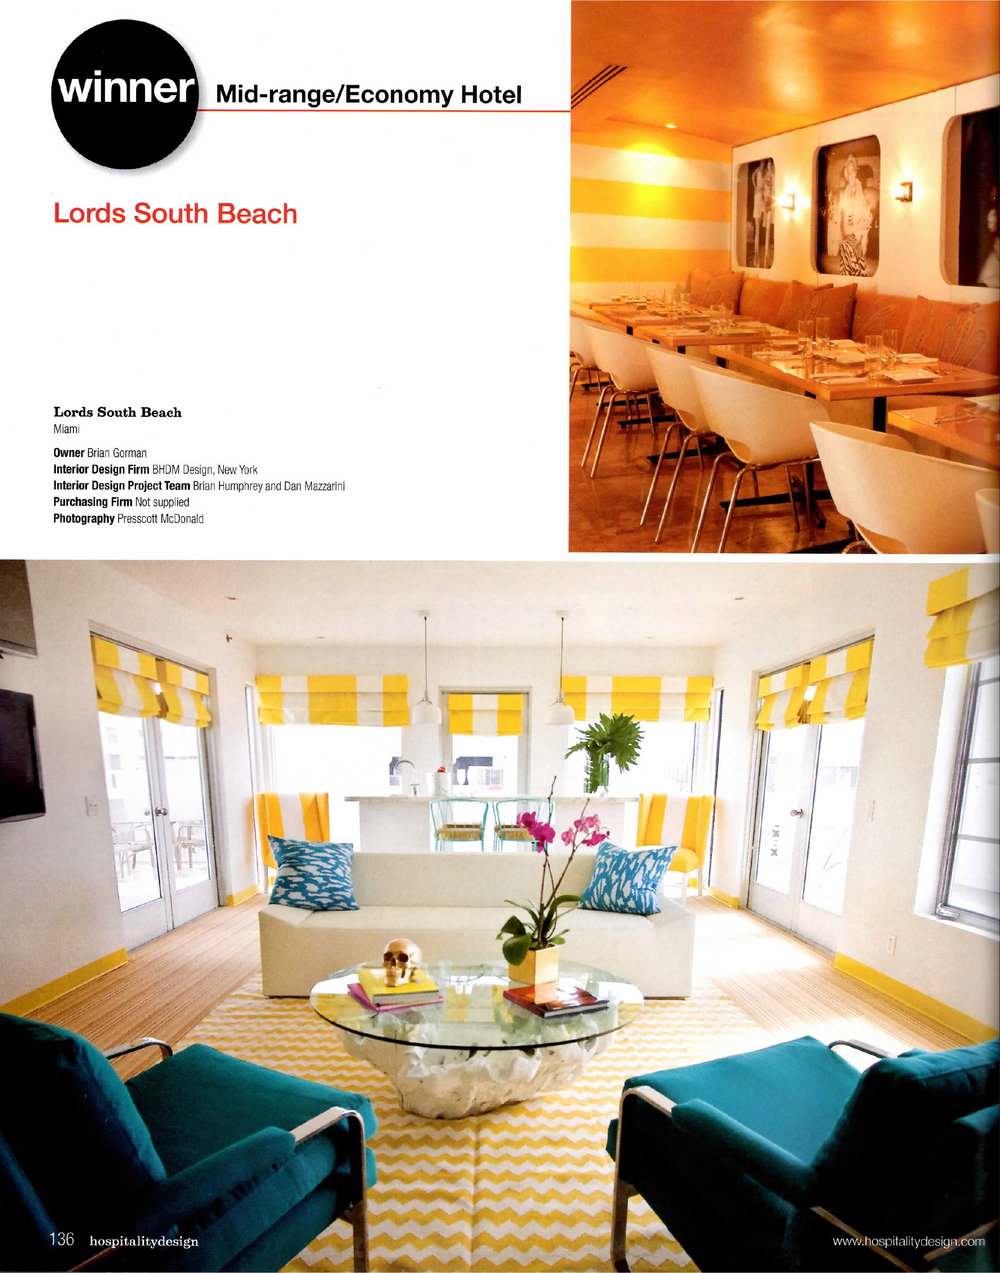 BHDM Hospitality Design 6.1.11 2.jpg